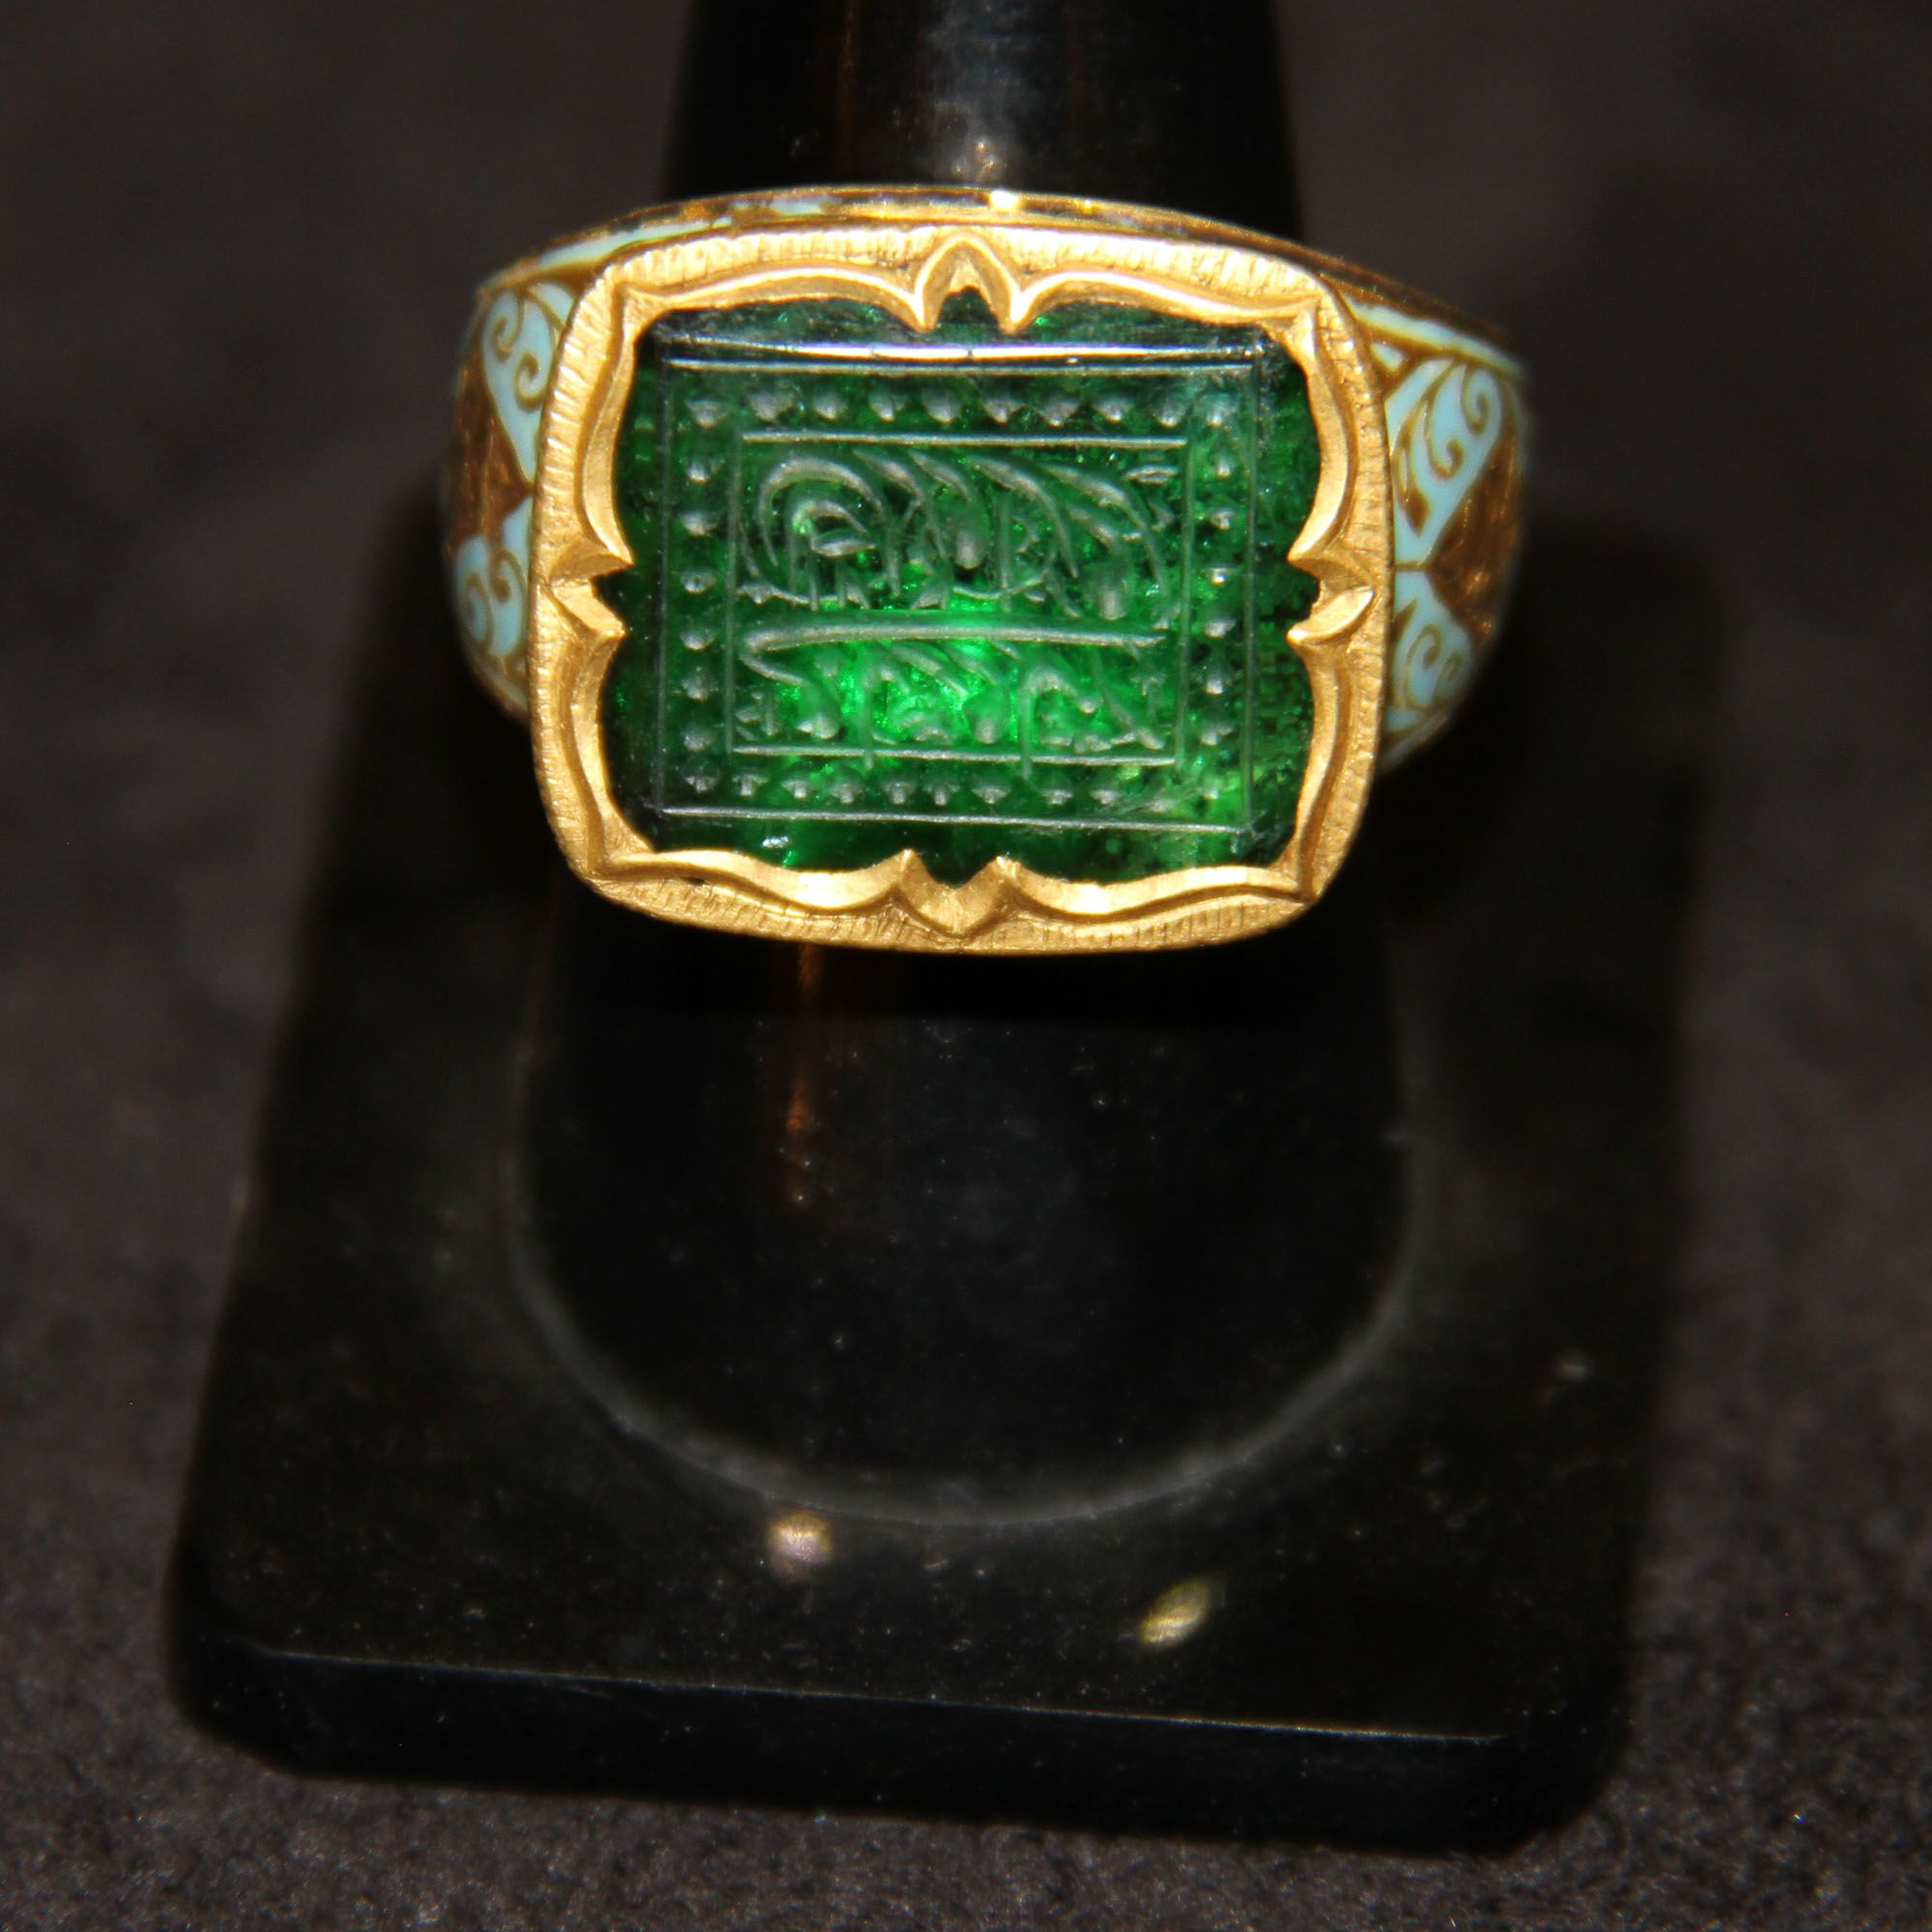 Jewelry | A Mughal Emerald Islamic Calligraphy Ring - The Curator's Eye